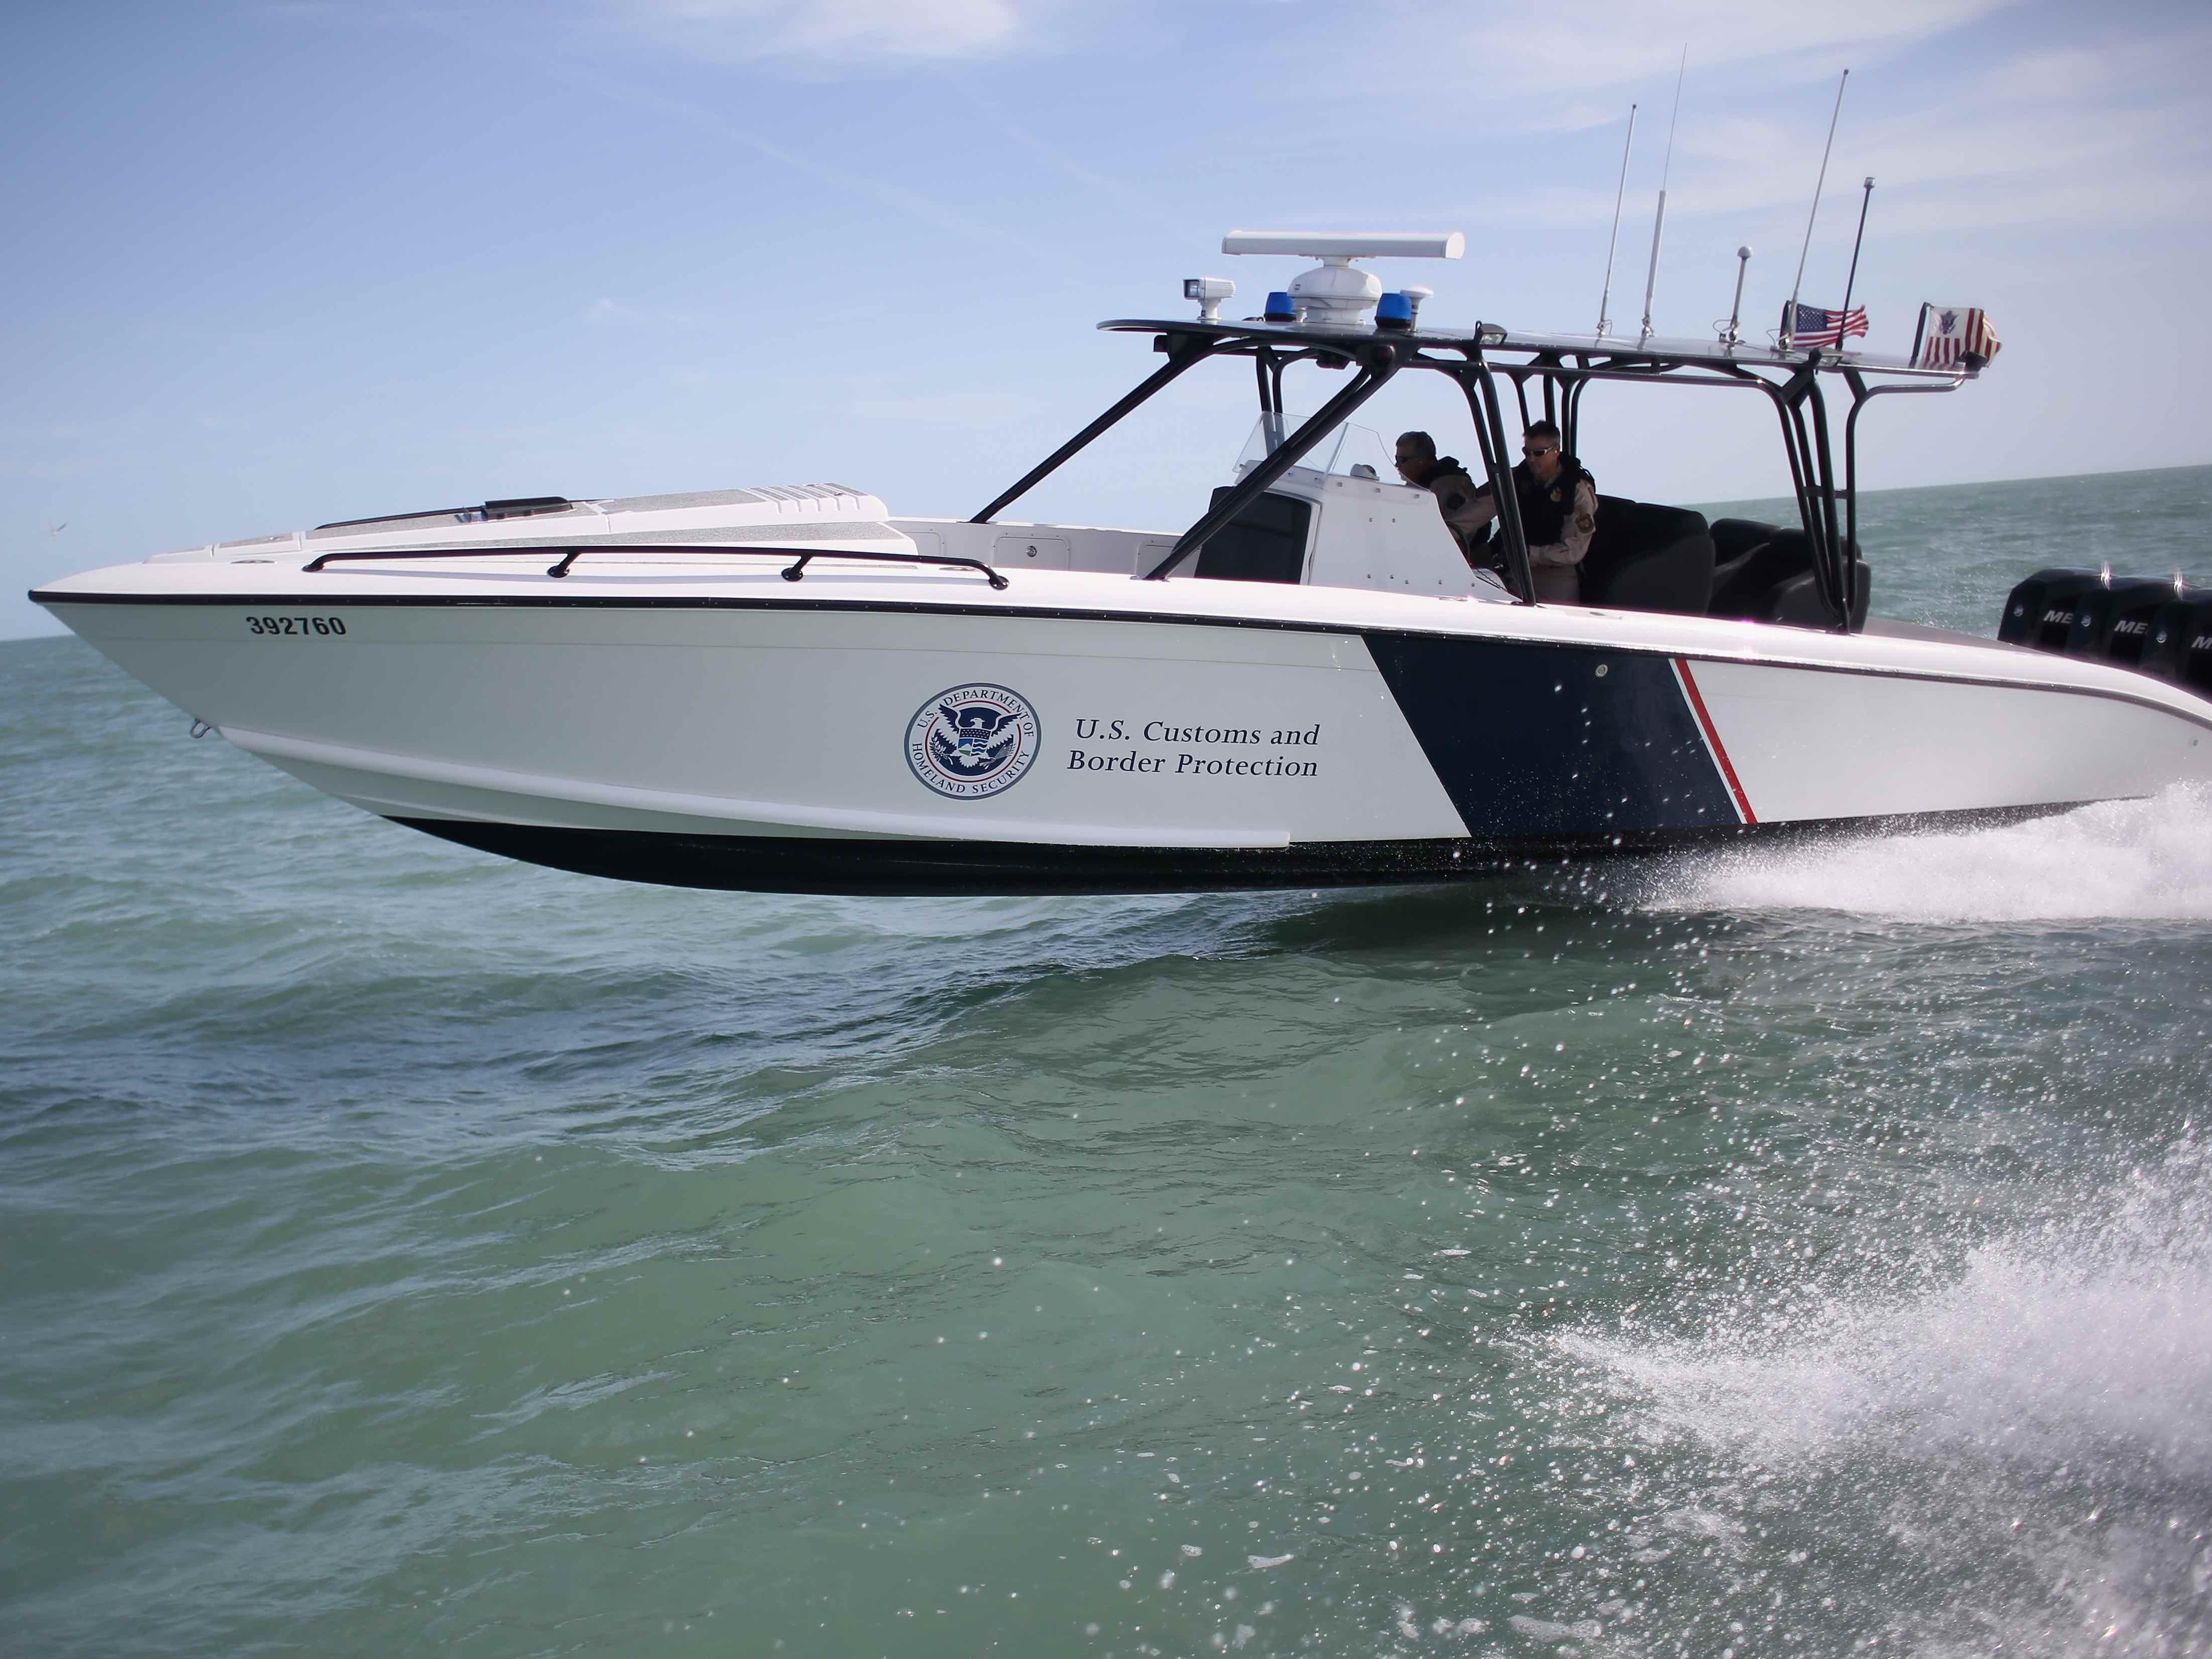 One Dead In Crash Between Illegal Alien Boat, Border Patrol ...